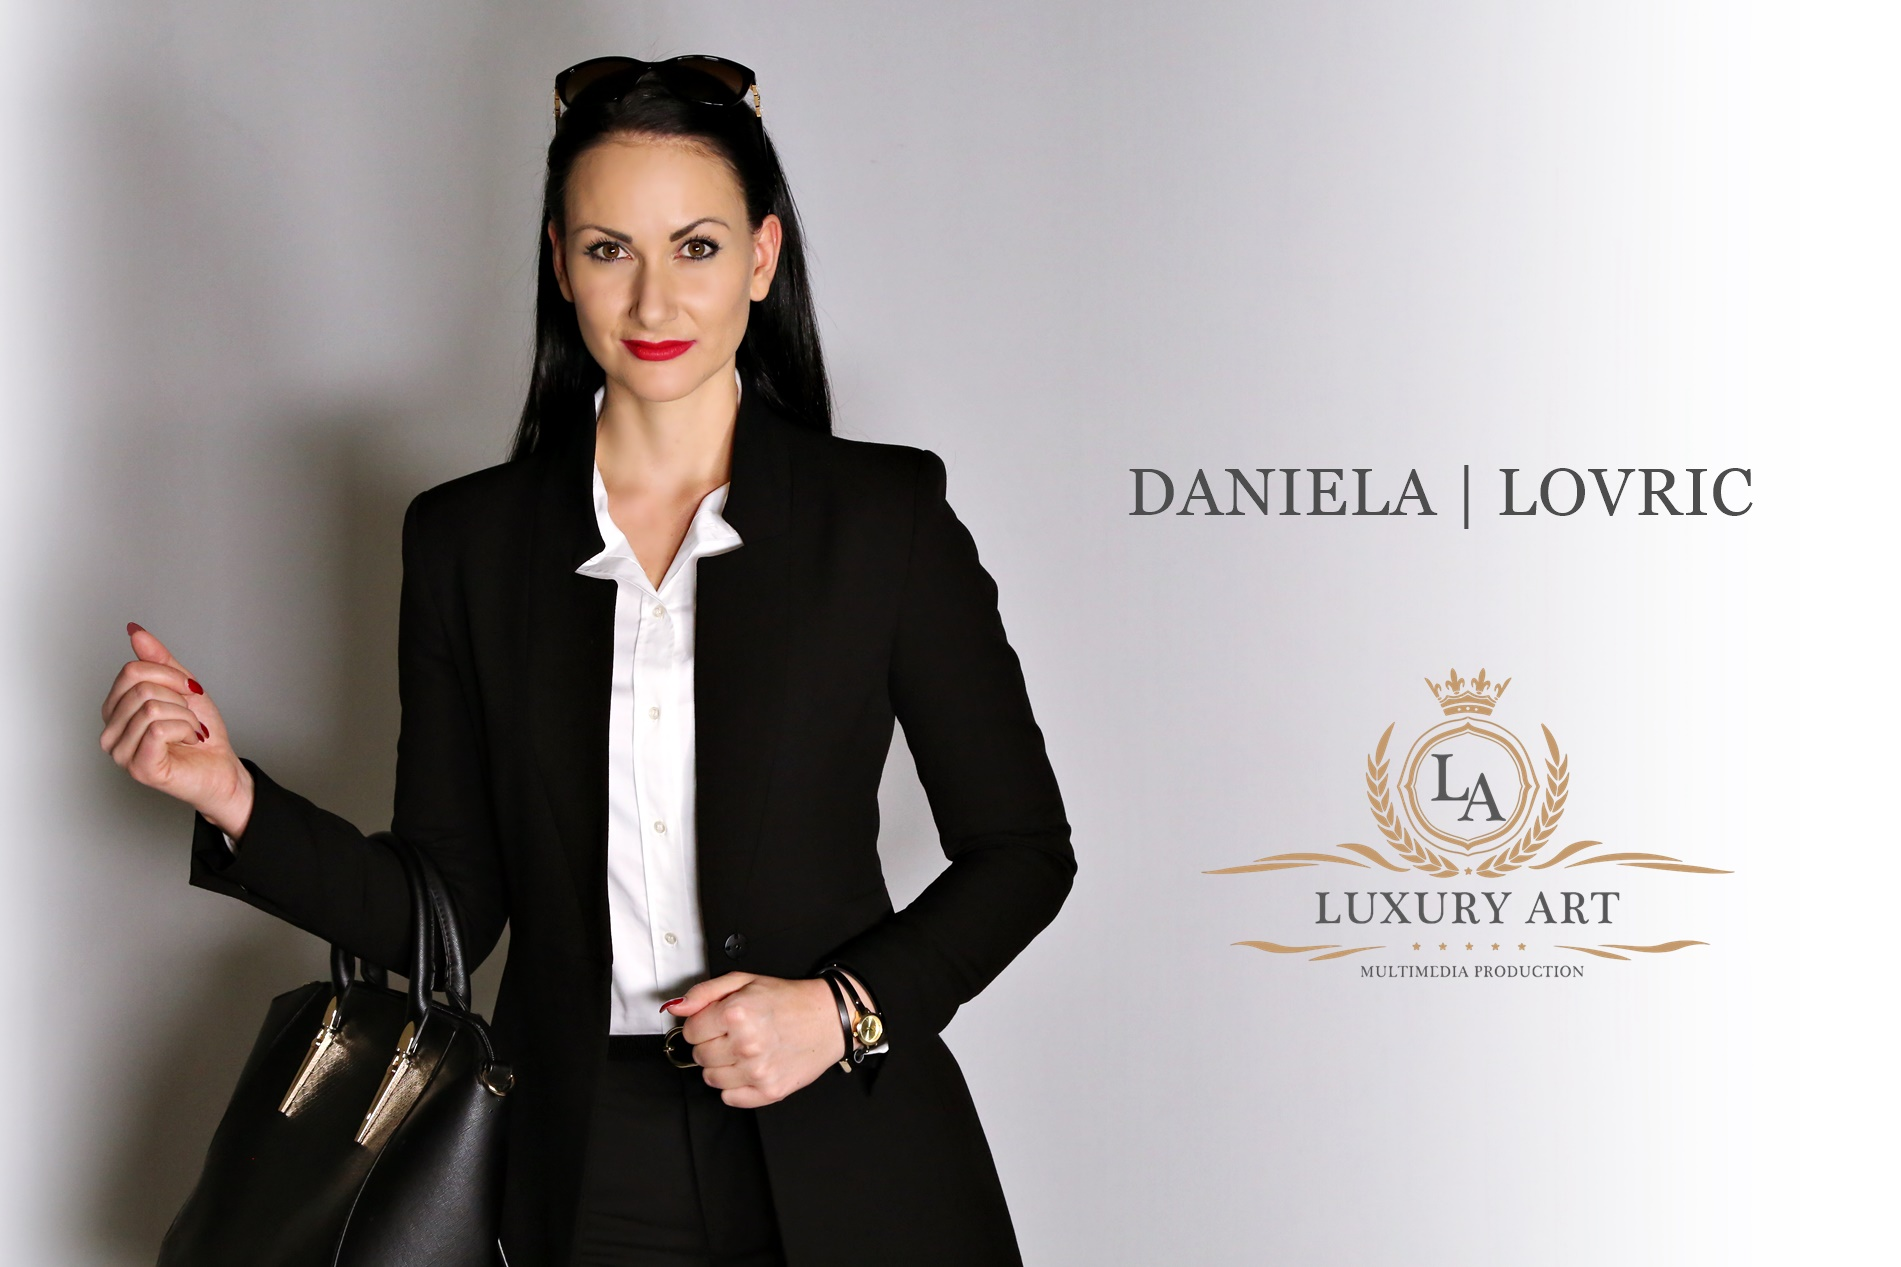 Daniela Lovric